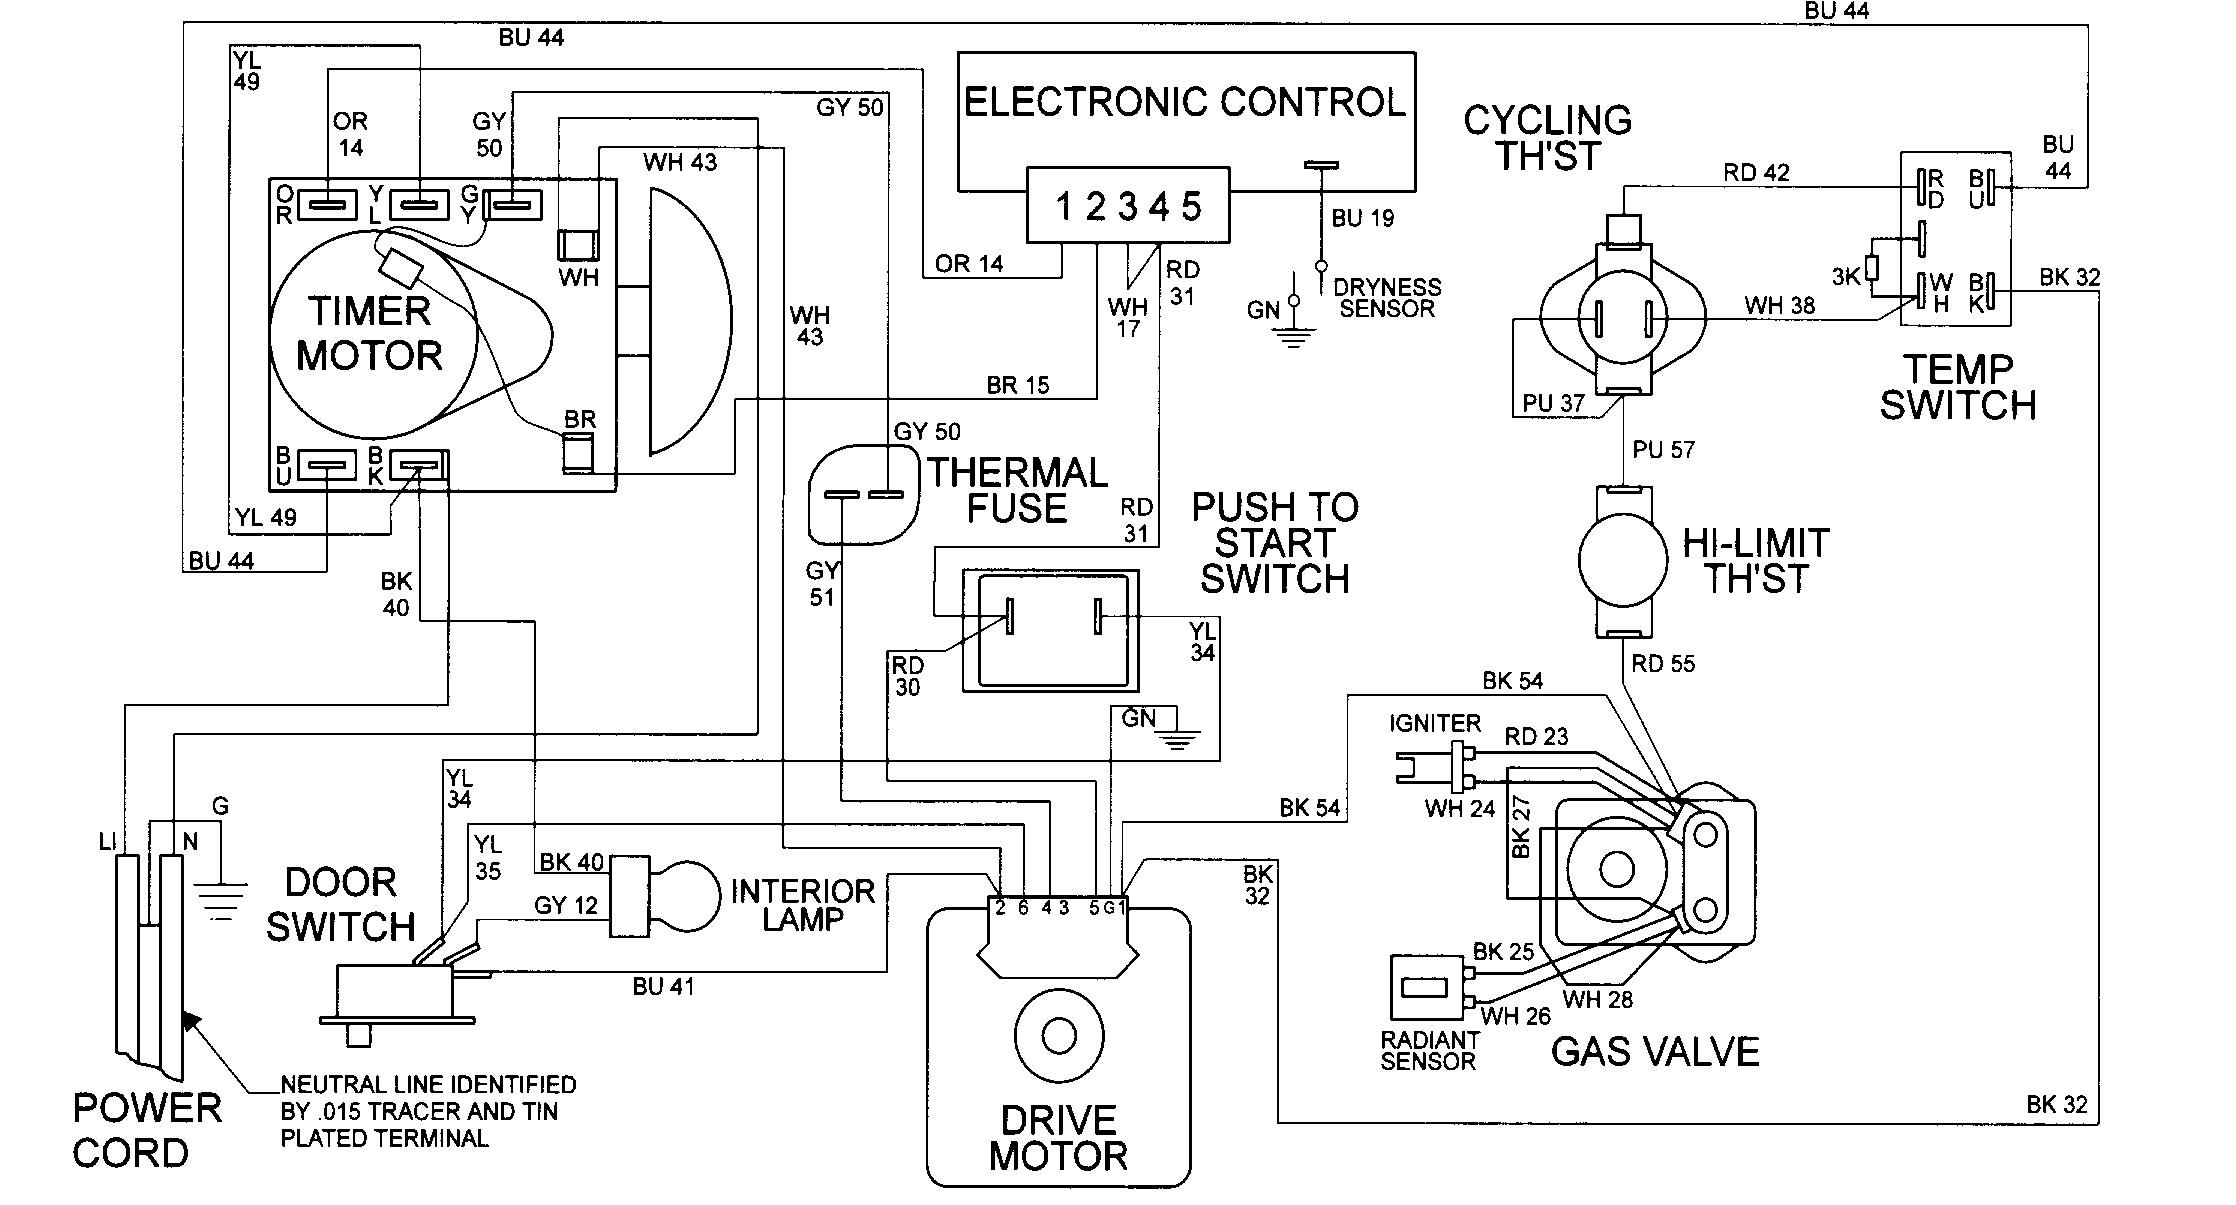 Whirlpool Dryer Wiring Diagram Diagram Besides Whirlpool Dryer Wiring Diagram Whirlpool Gas Of Whirlpool Dryer Wiring Diagram